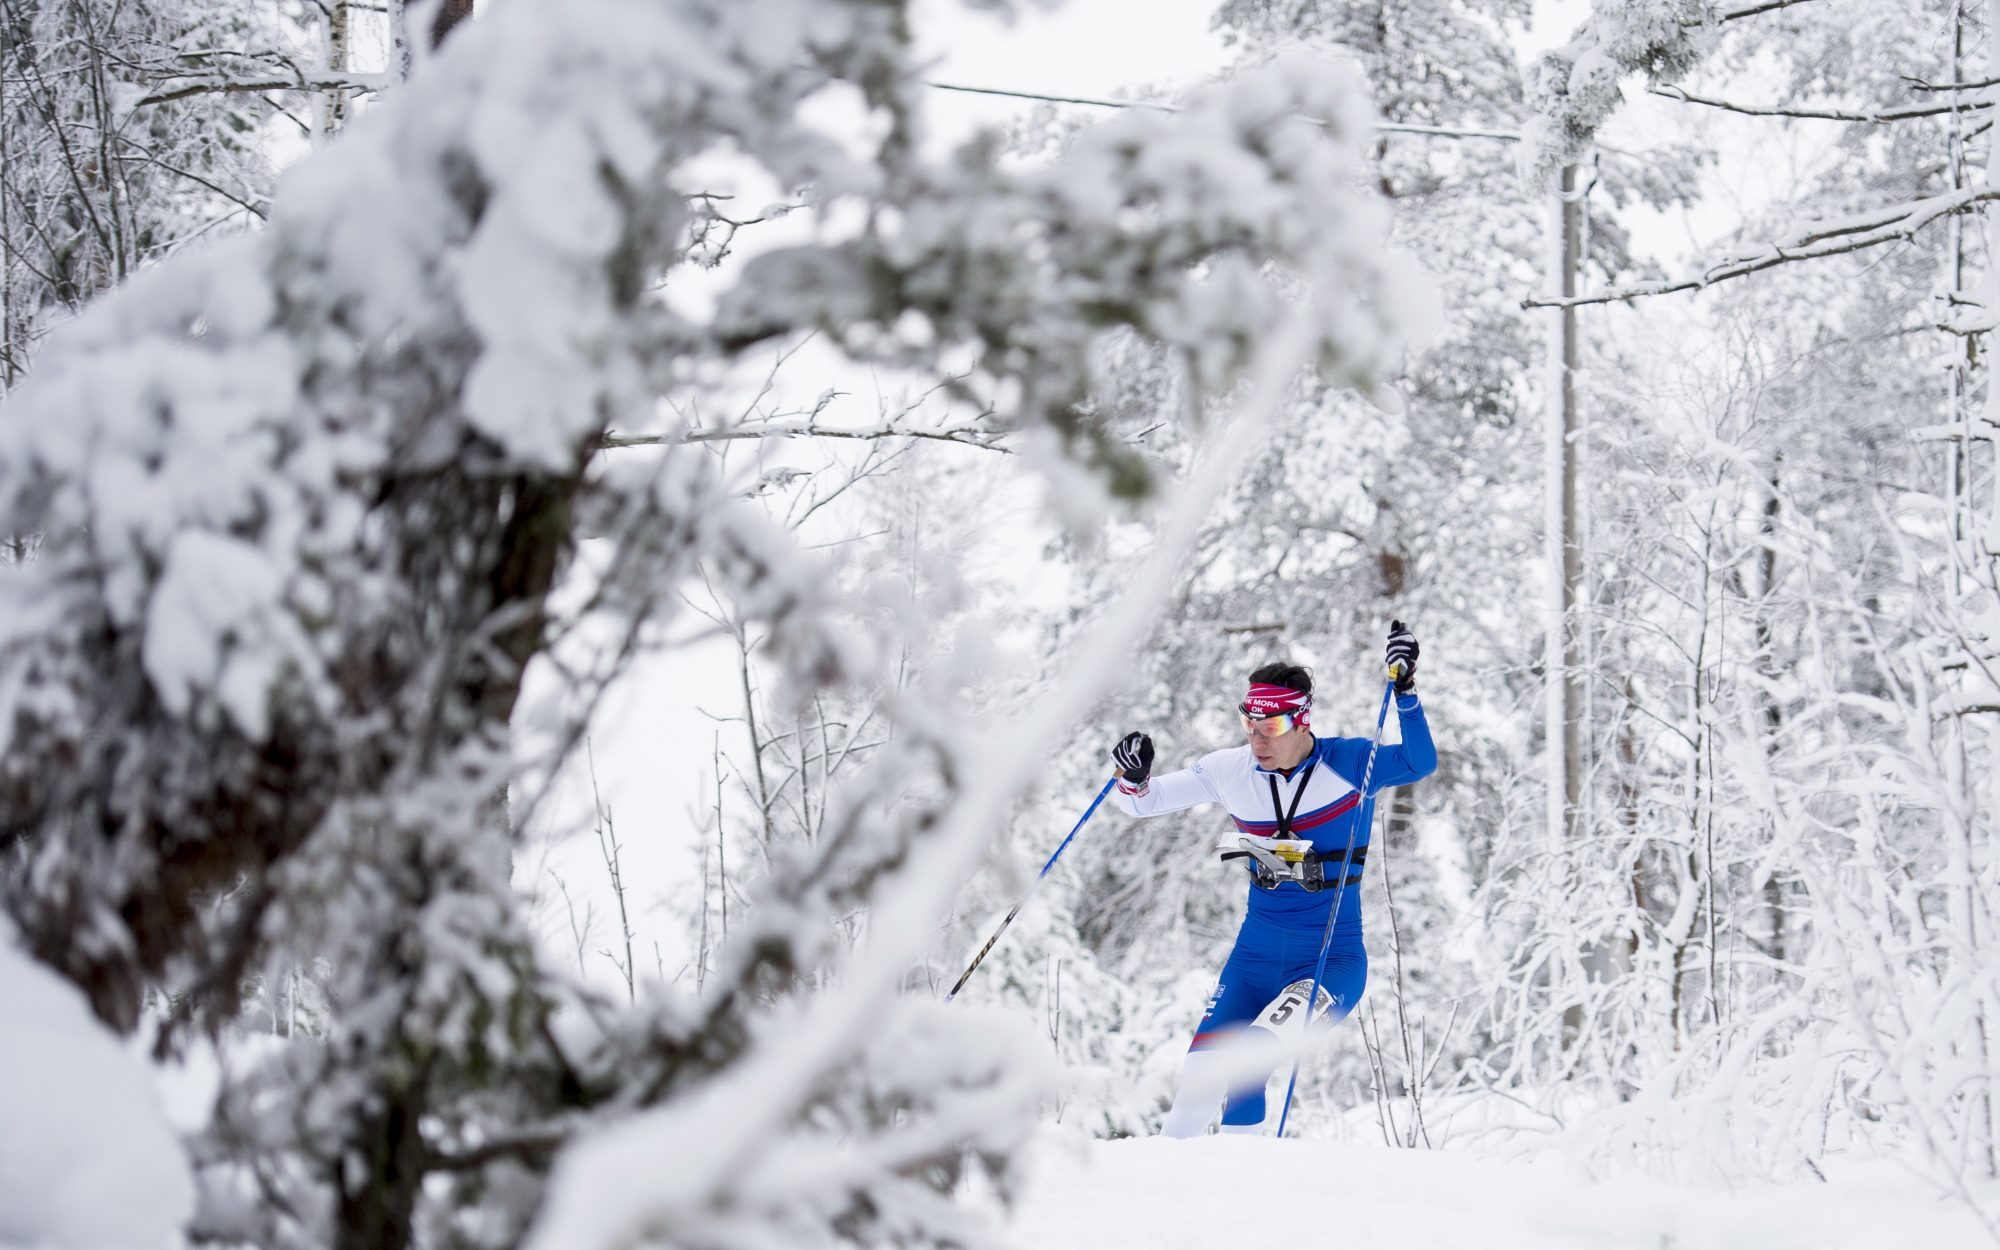 SM-veckan skidorientering 2015, dag 4